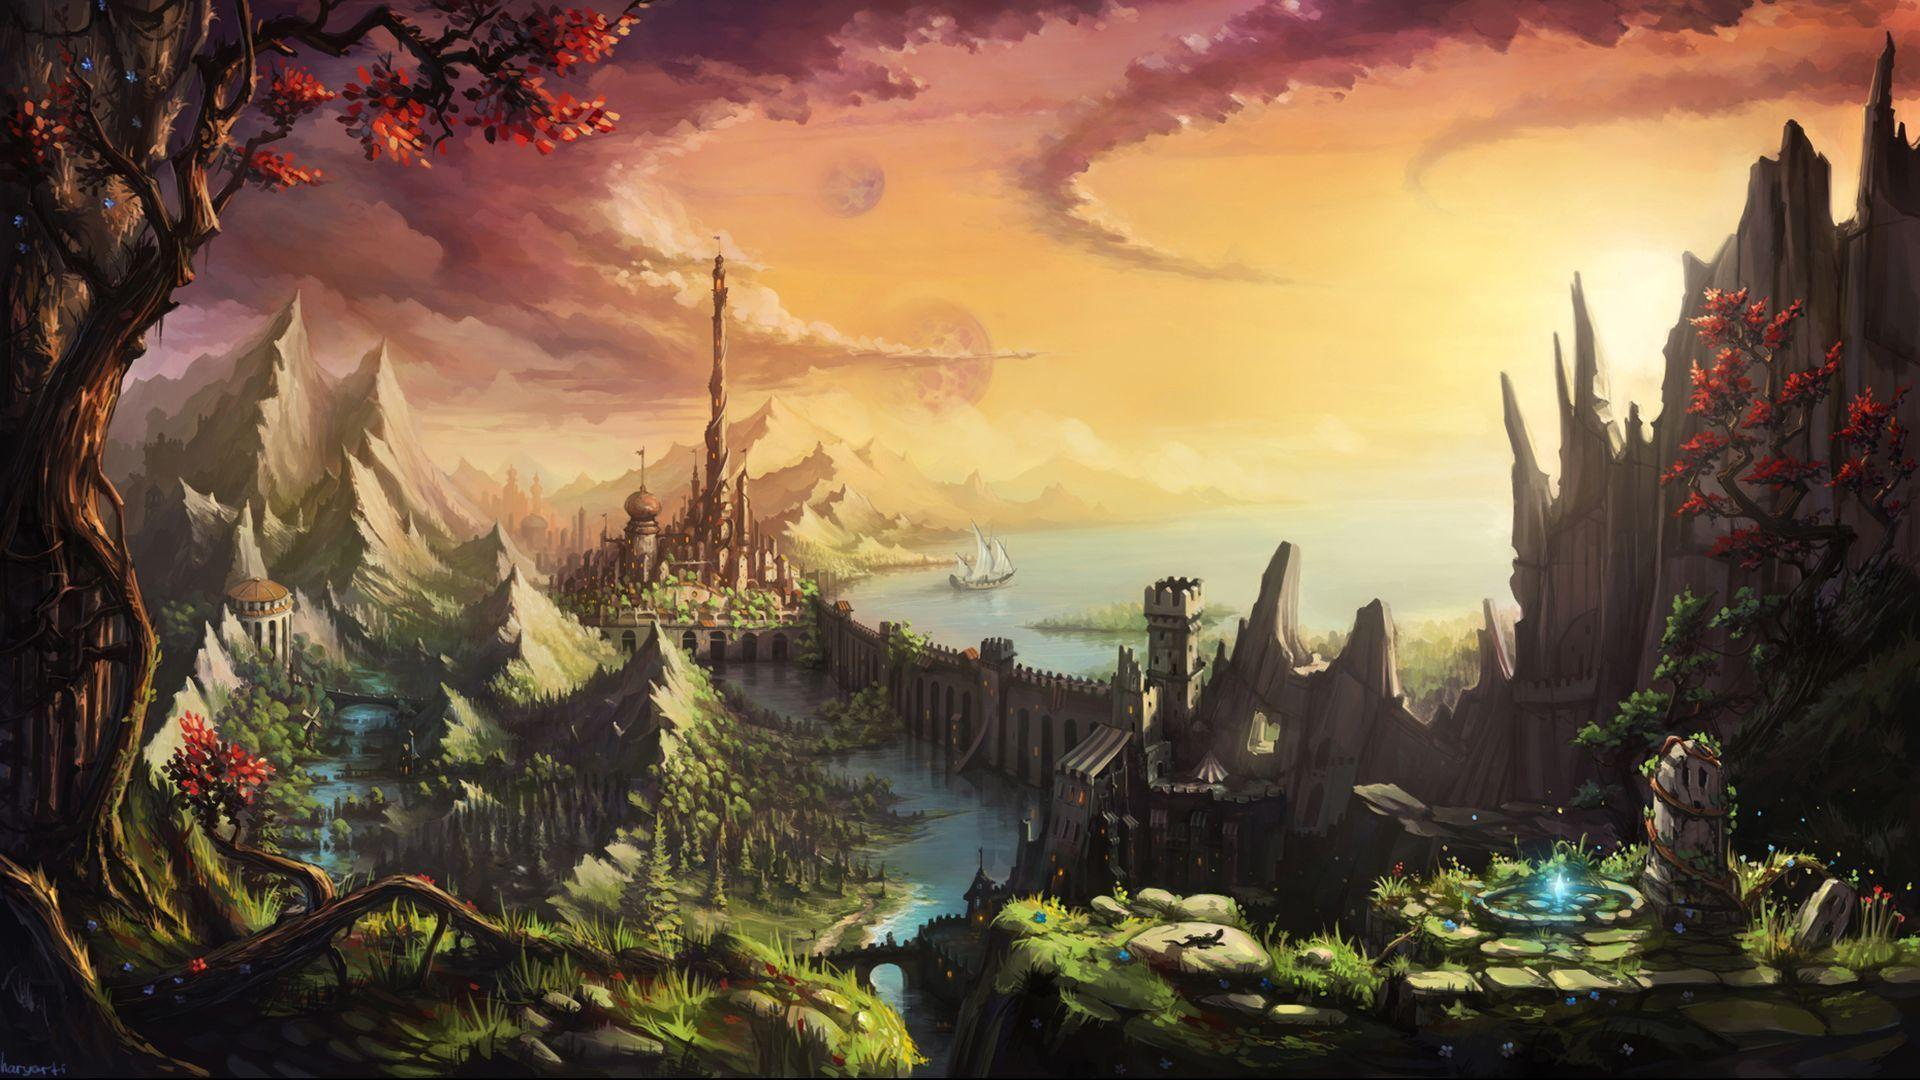 magic castle fantasy world - photo #34